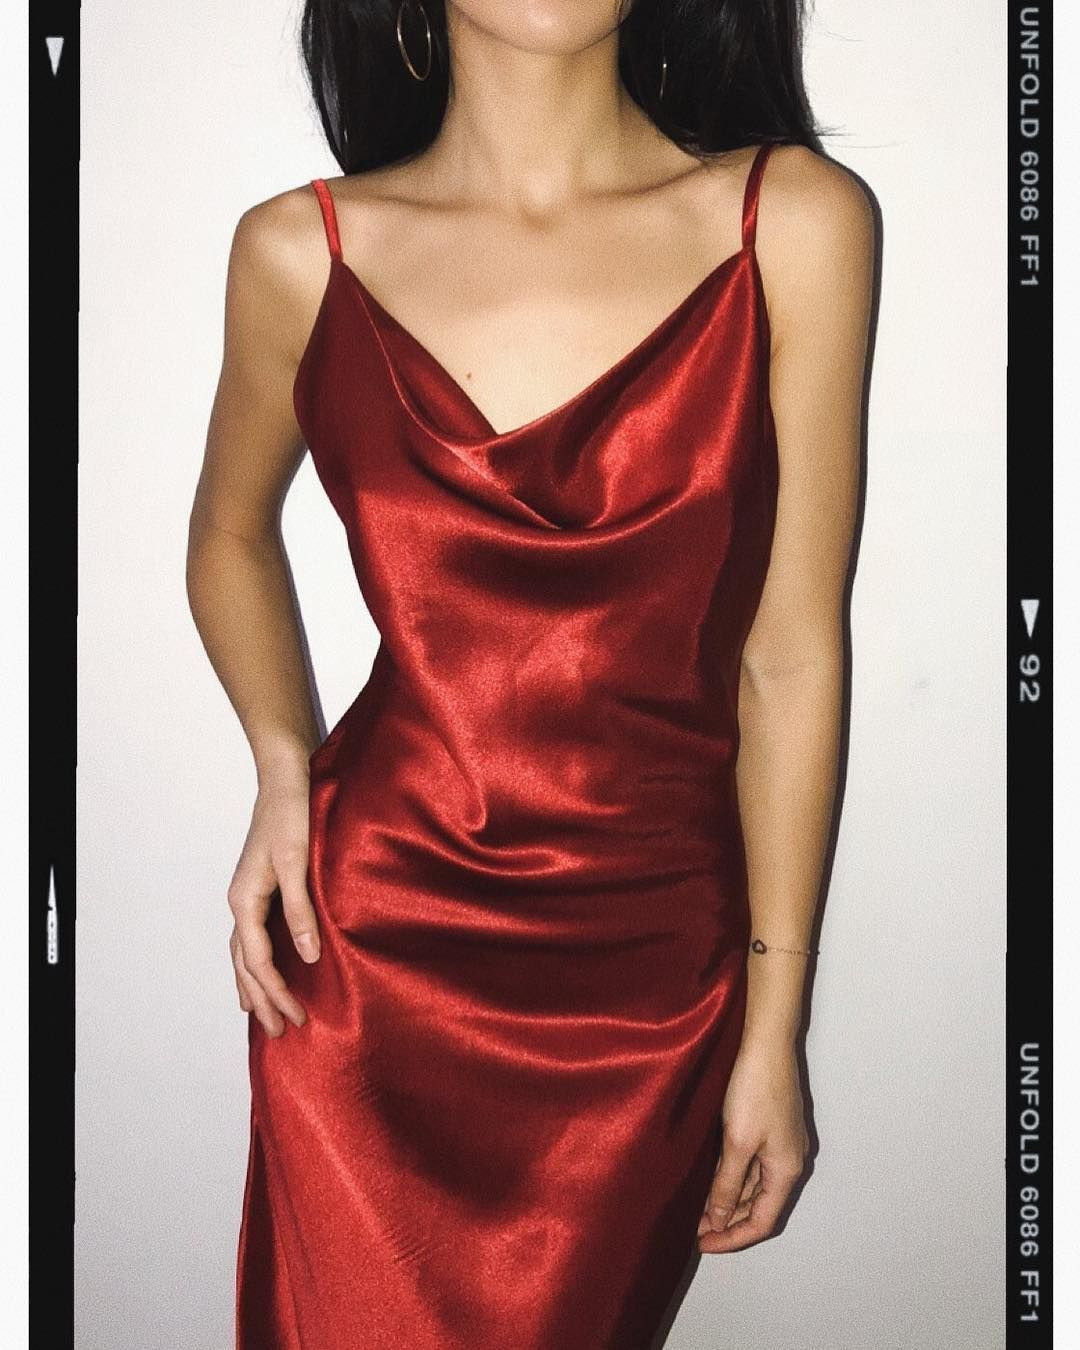 Pin By Womens Fashion On Grayson2206runolfstht In 2020 Silk Prom Dress Silk Dress Red Silk Dress